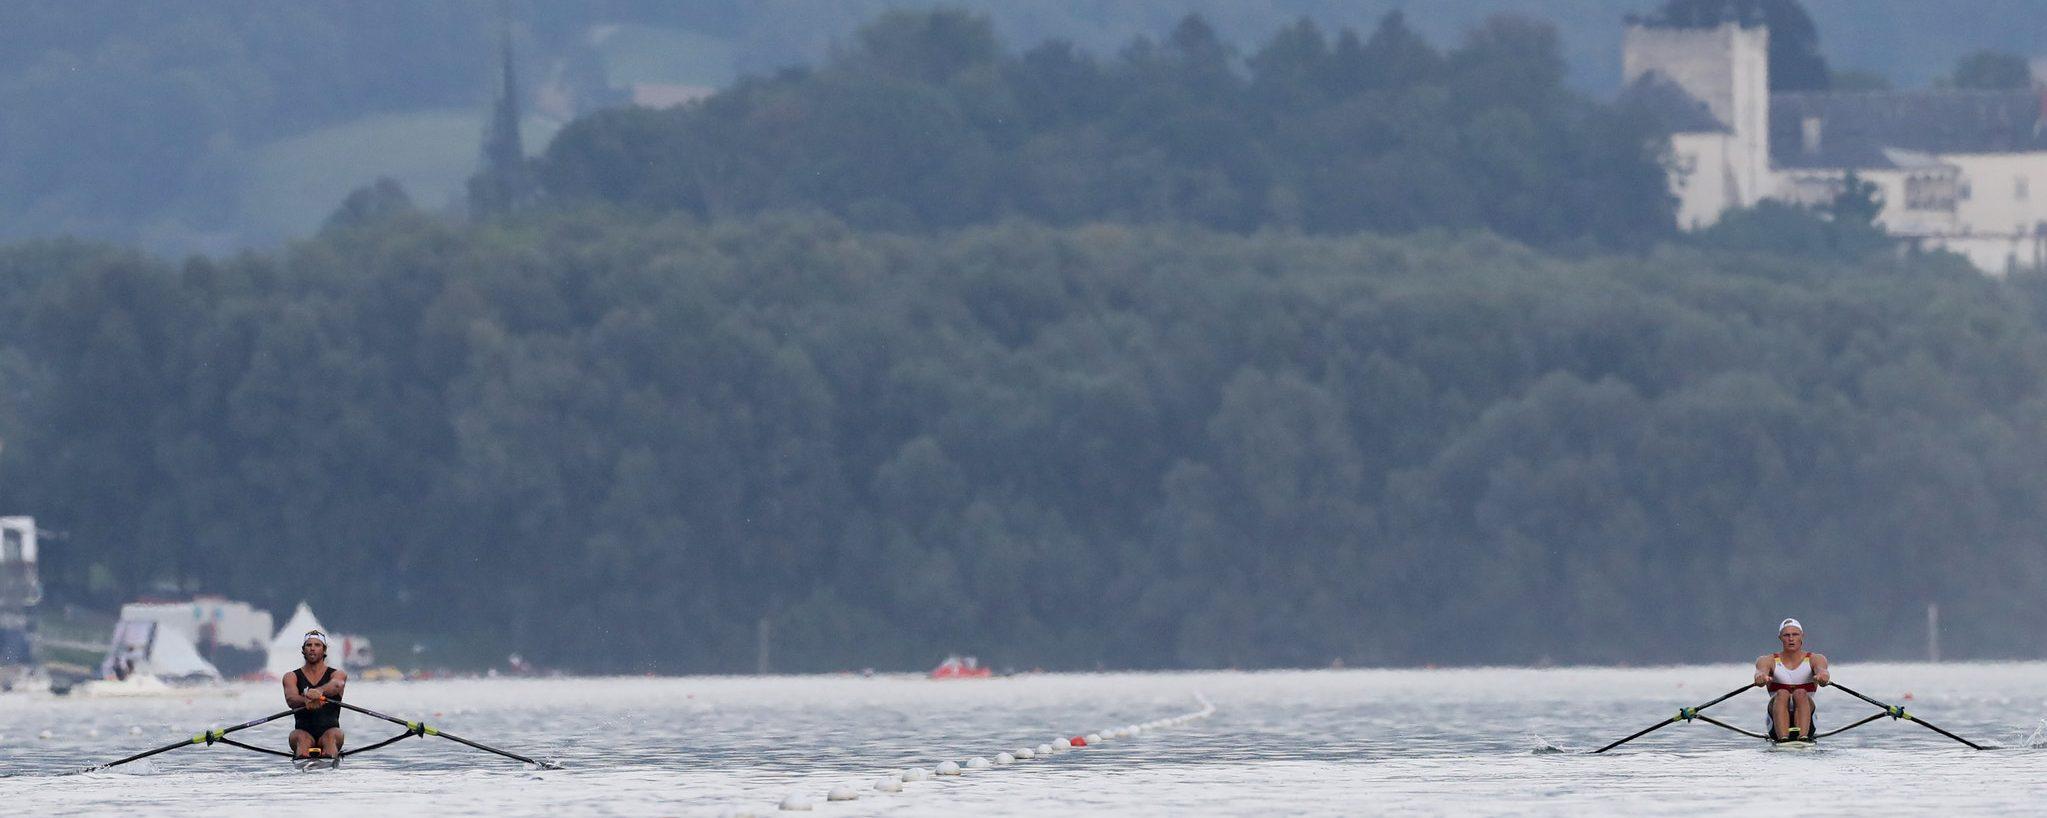 Blade Depth in Rowing